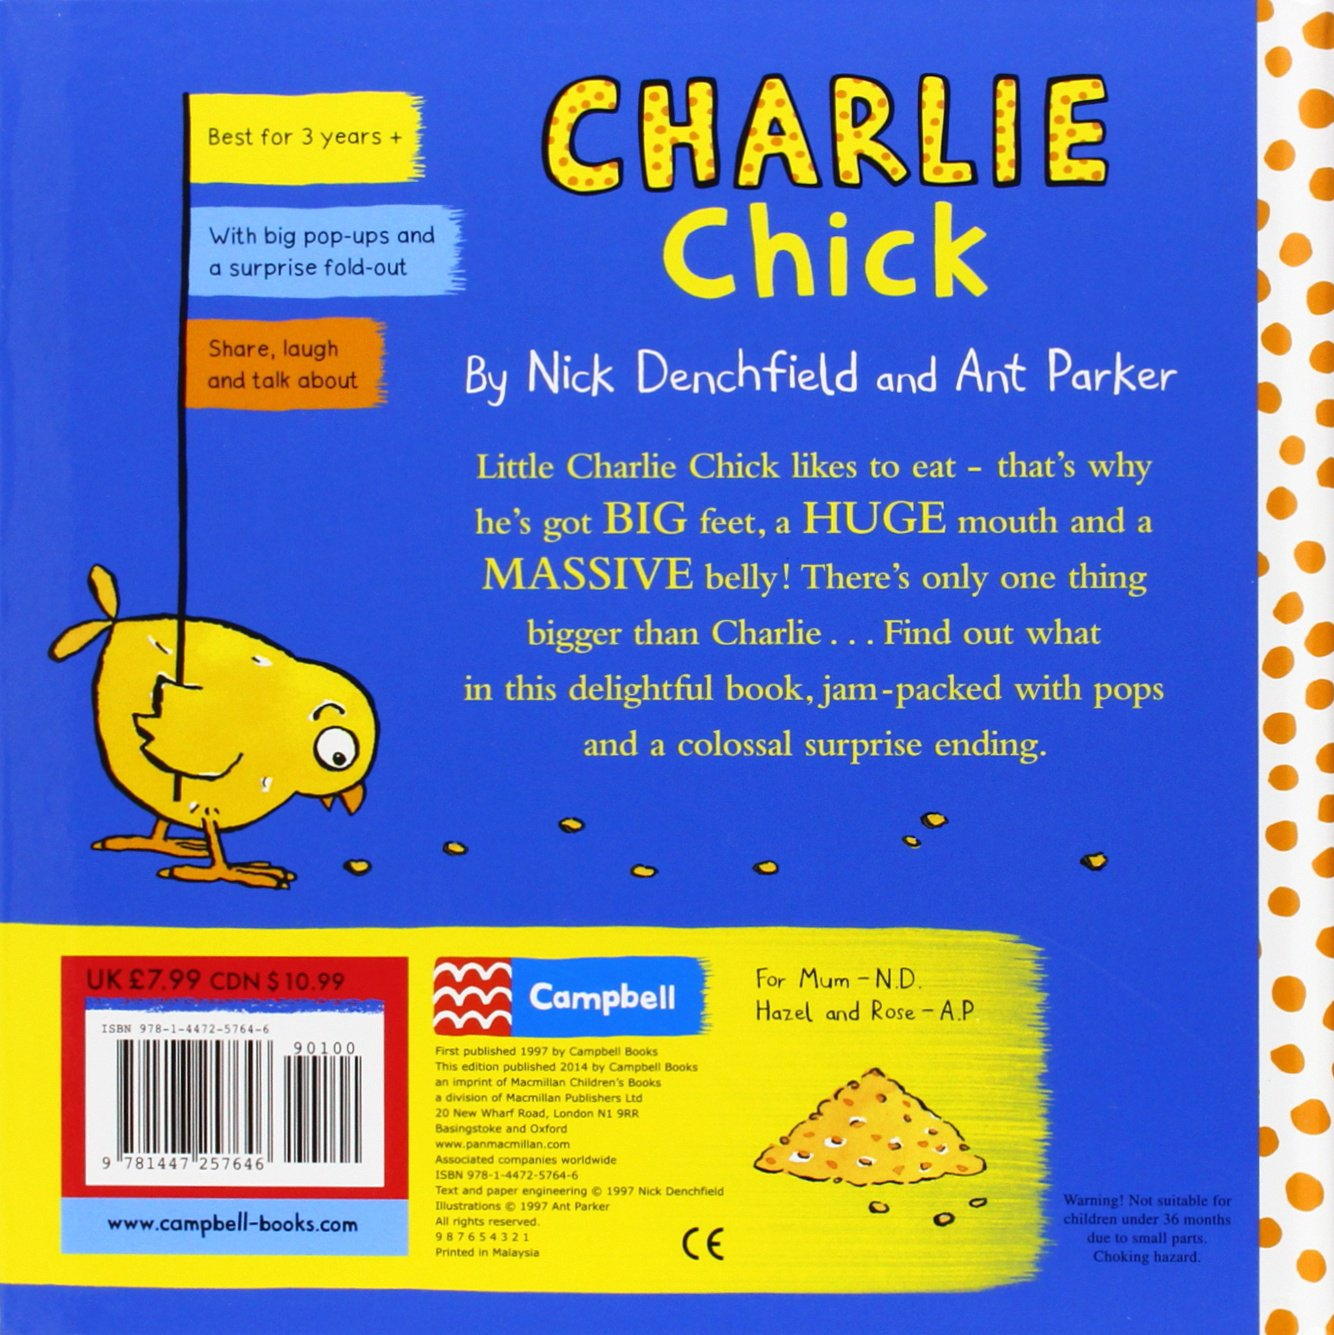 Charlie Chick: Charlie Chick series